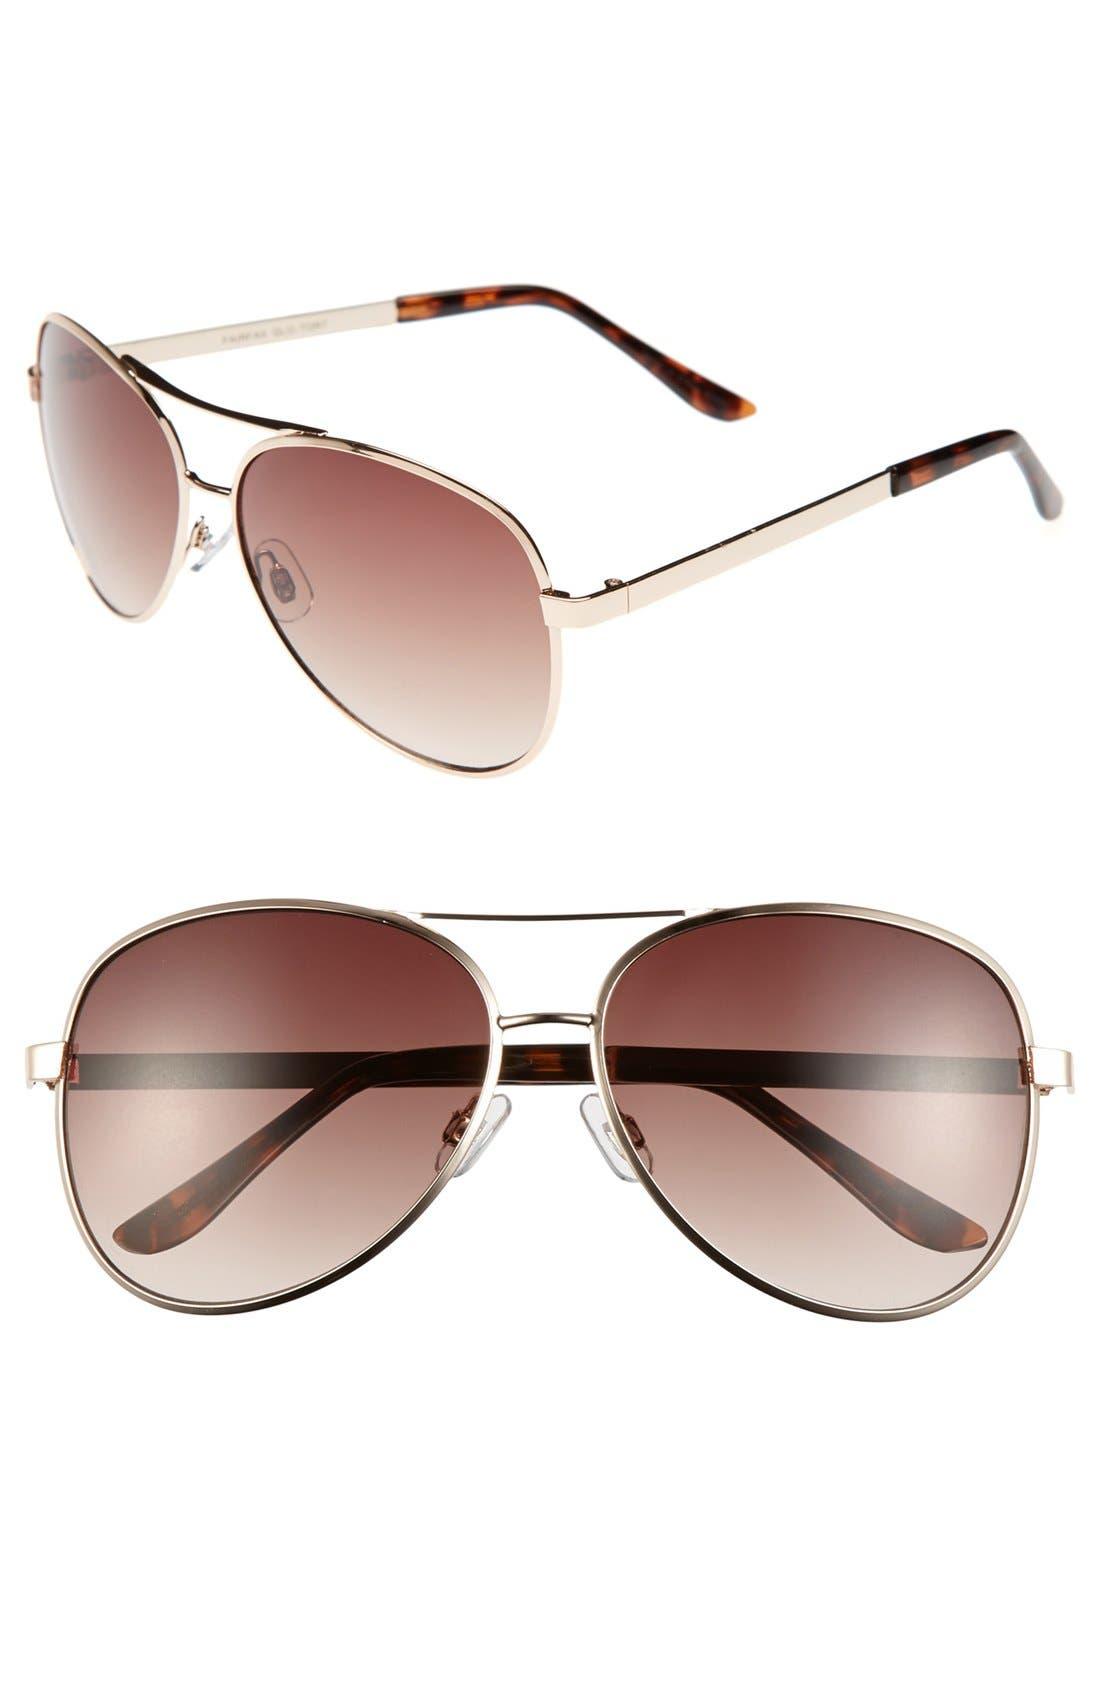 Main Image - Outlook Eyewear 'Fairfax' 59mm Aviator Sunglasses